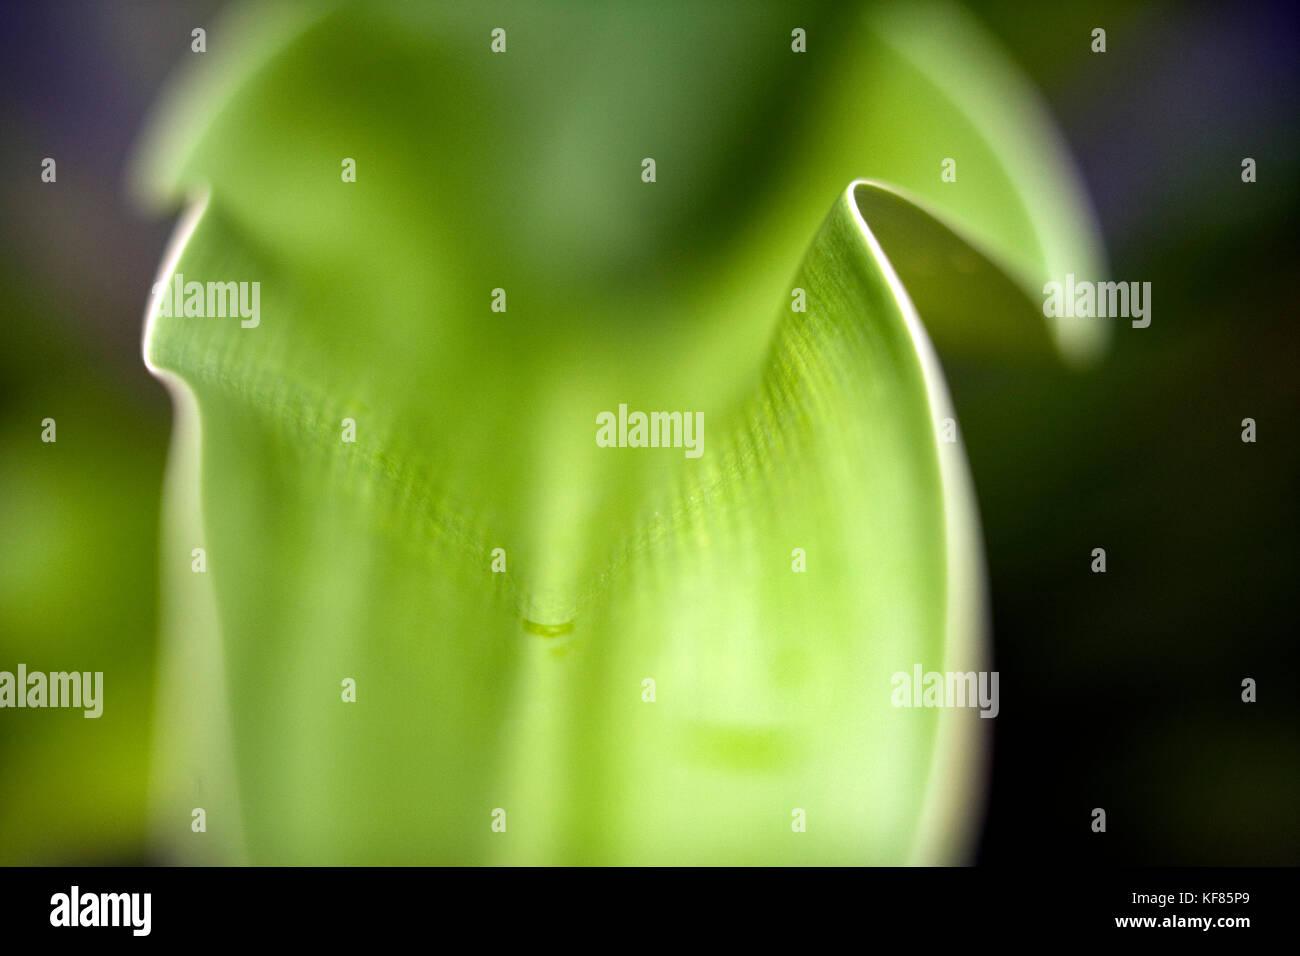 INDONESIA, Mentawai Islands, Kandui Resort, close-up of green leaf - Stock Image